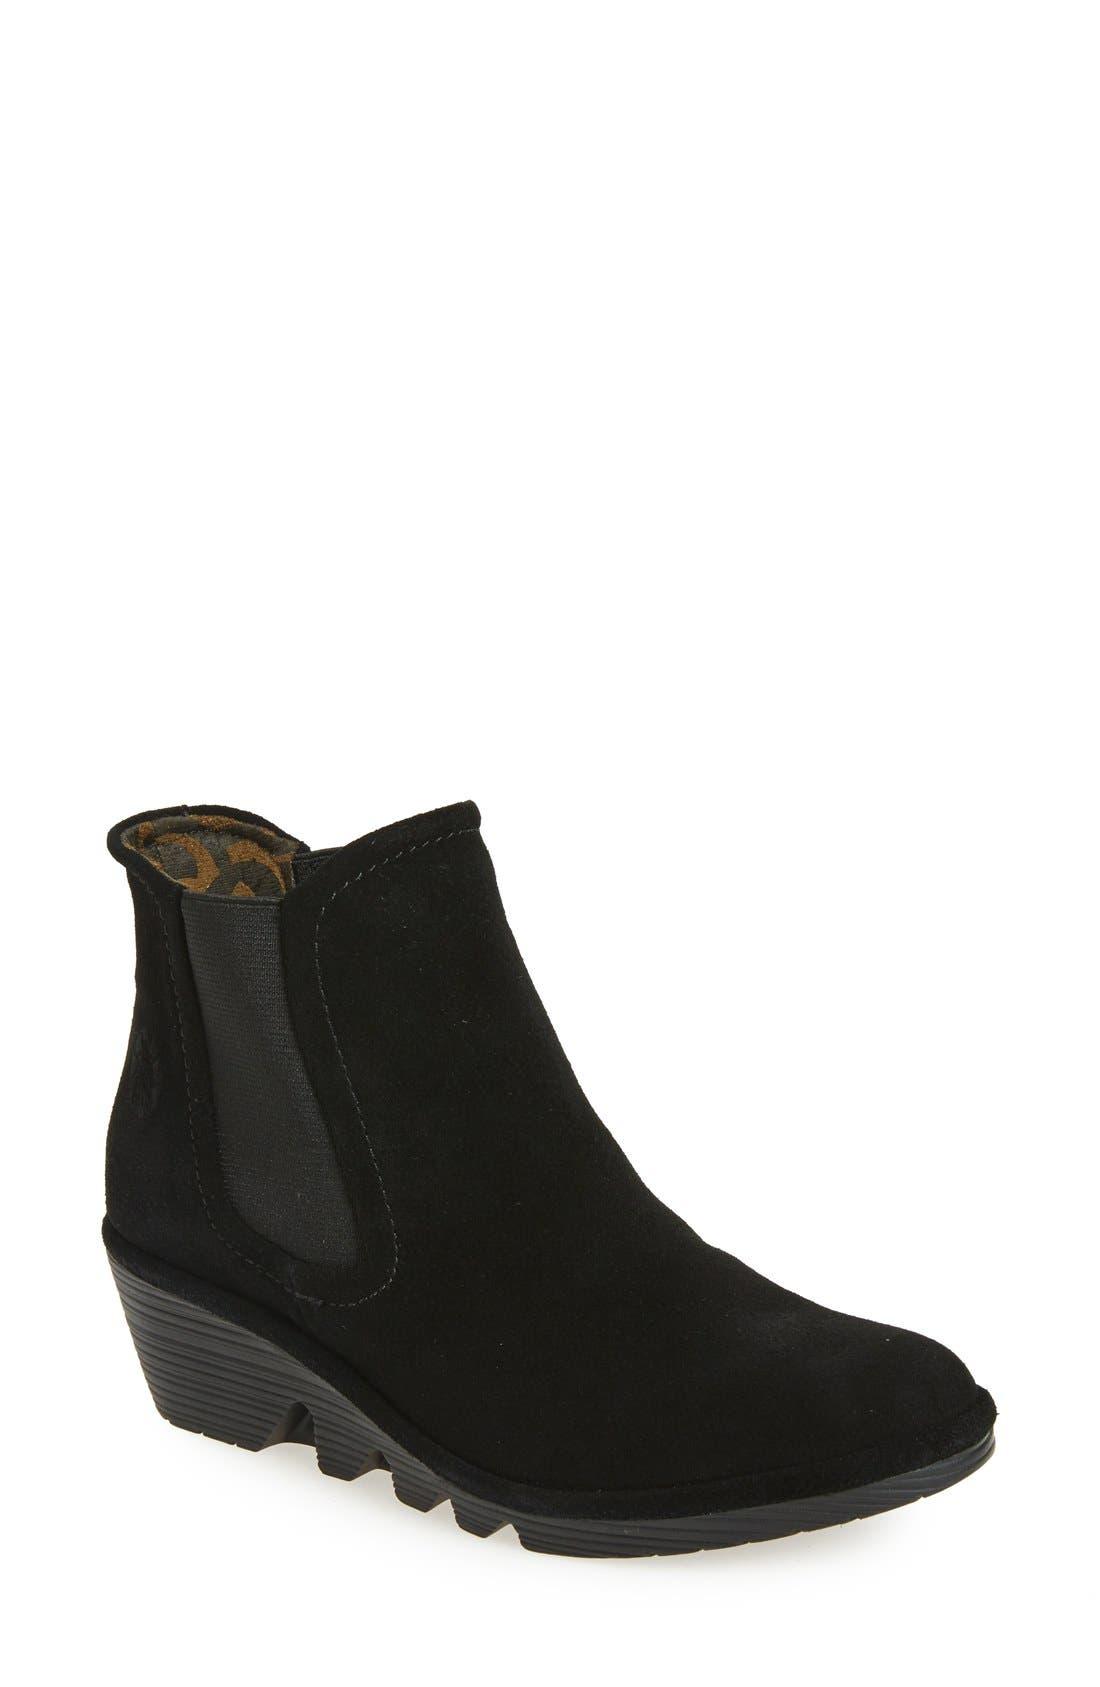 Alternate Image 1 Selected - Fly London 'Phil' Chelsea Boot (Women)